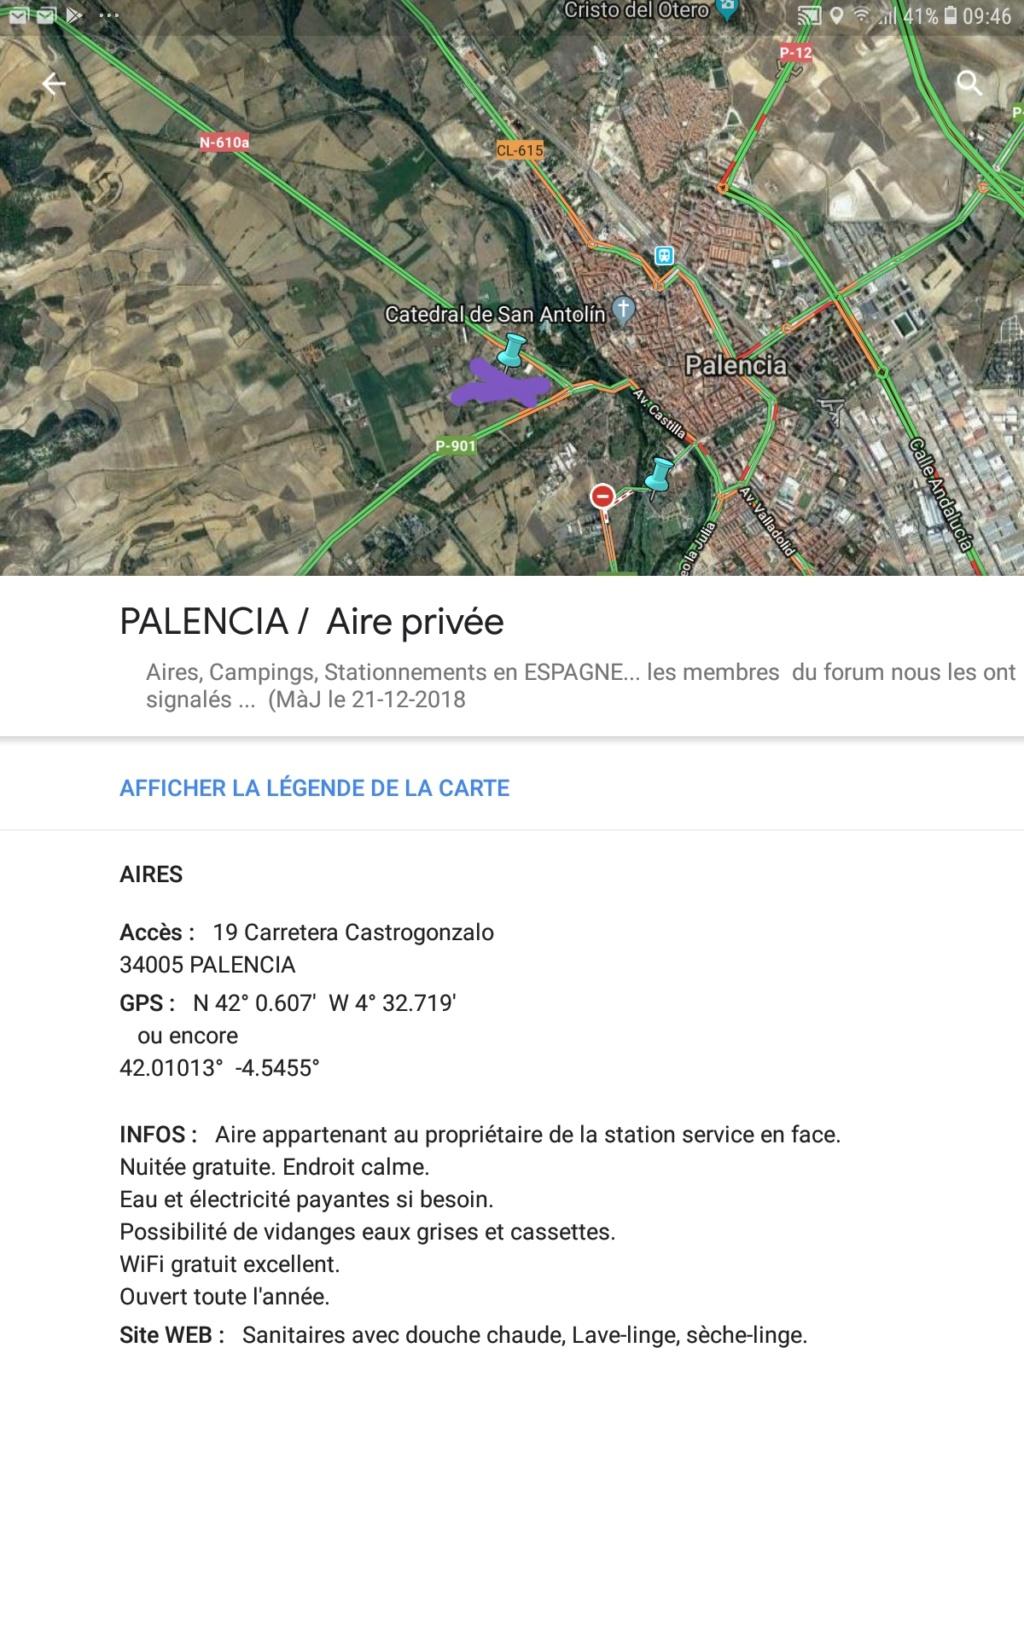 [ESPAGNE] Aire de camping car Suances à Palencia (entre Valladolid et Burgos) 20190911